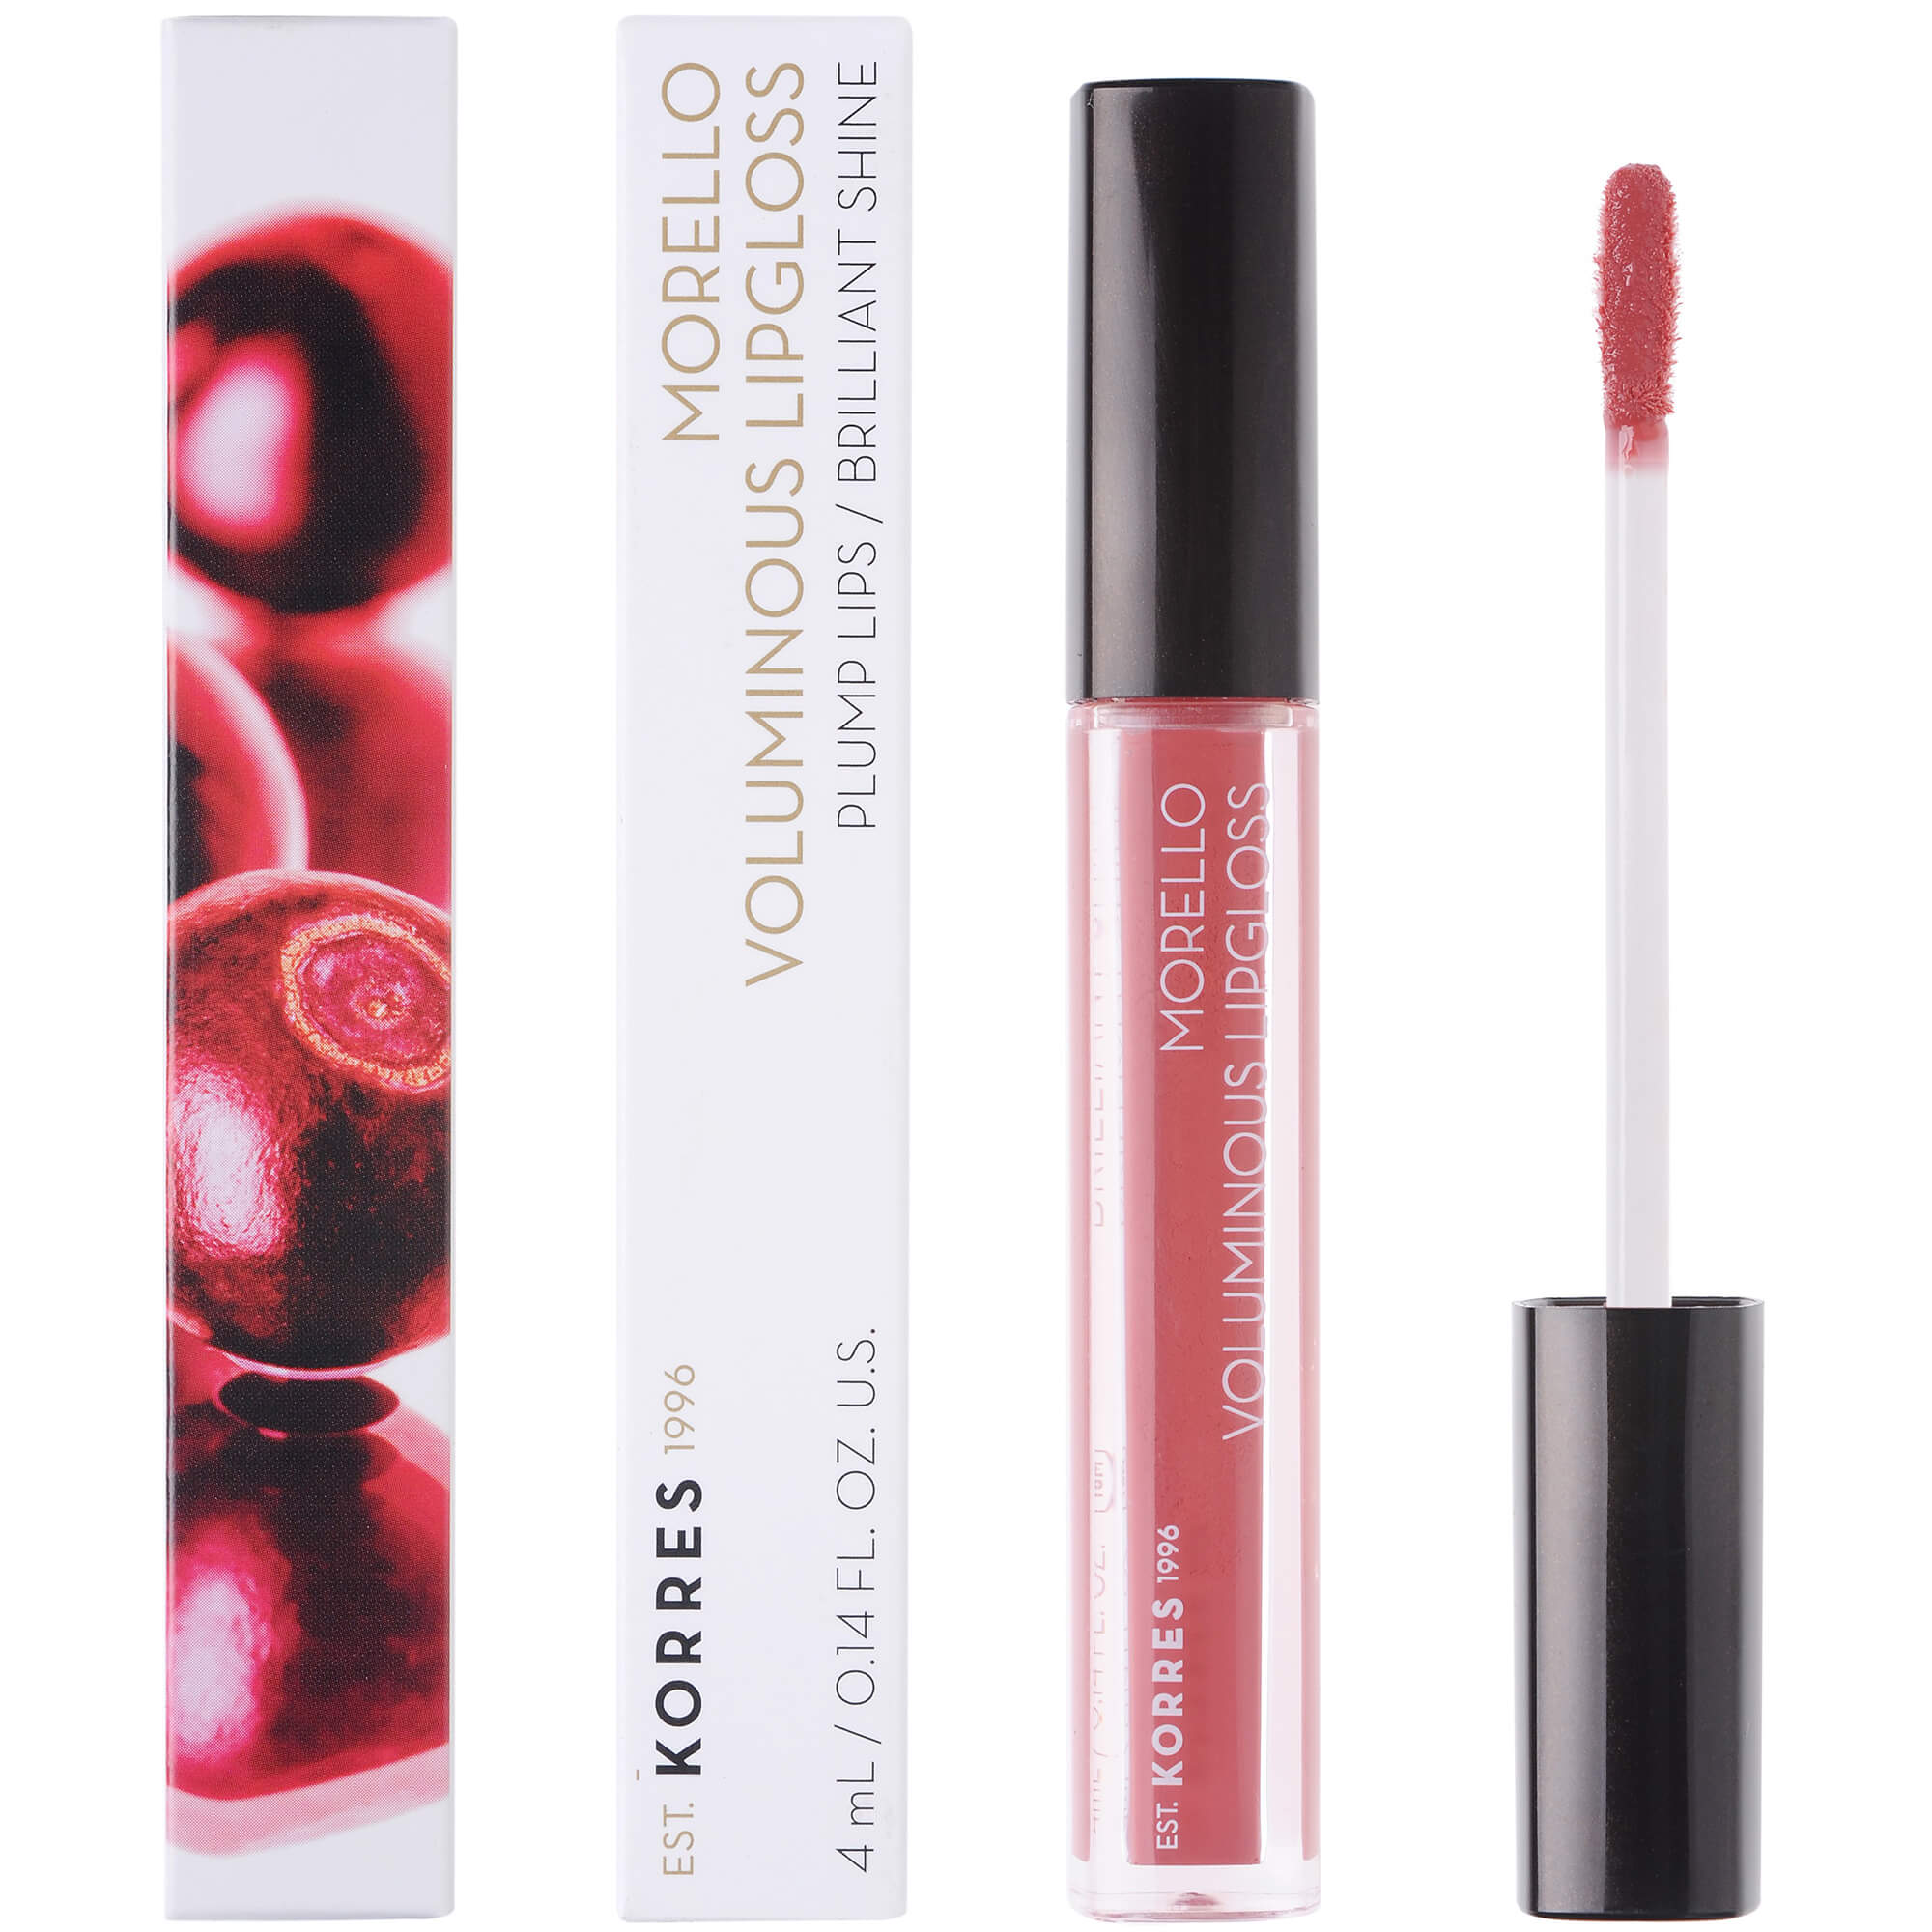 Korres Morello Voluminous Lipgloss Brilliant Shine Ενυδατικό Lipgloss με Εξαιρετική Λάμψη & Γεμάτο Χρώμα που Διαρκεί 4ml – 16 Blushed Pink